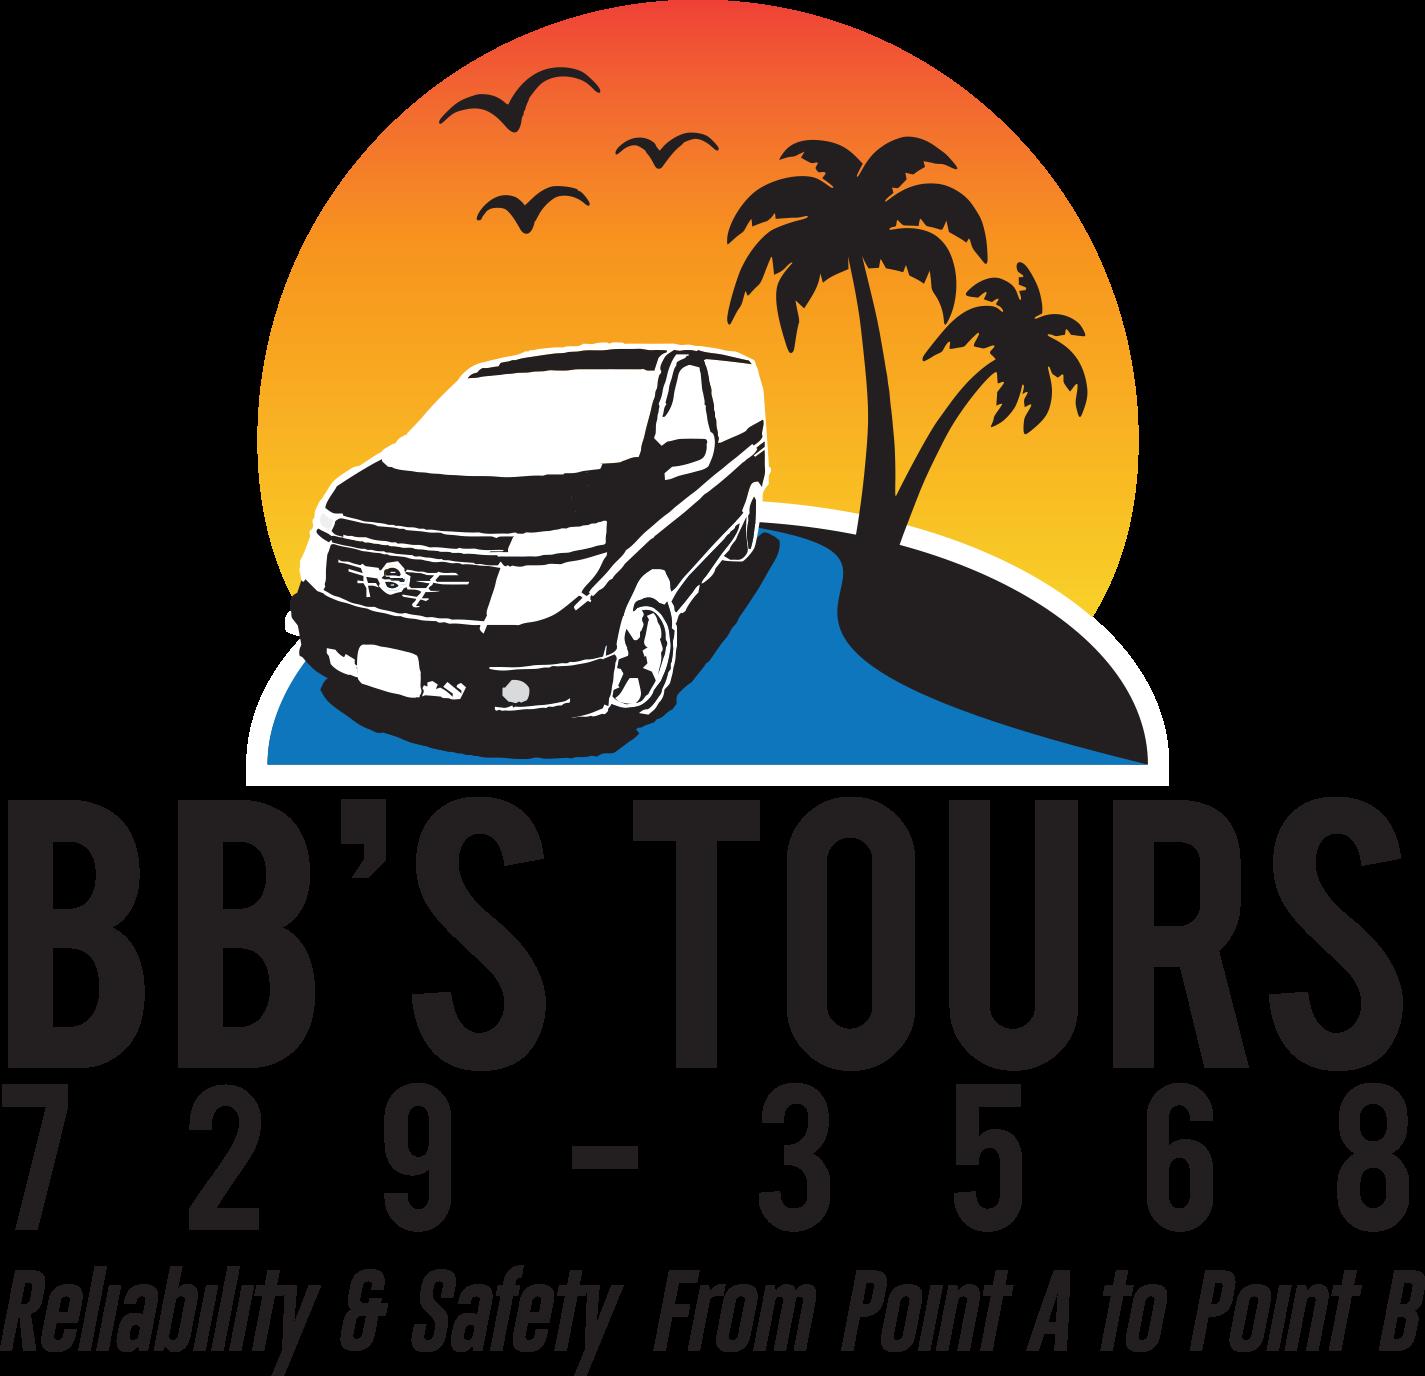 BB's Tours